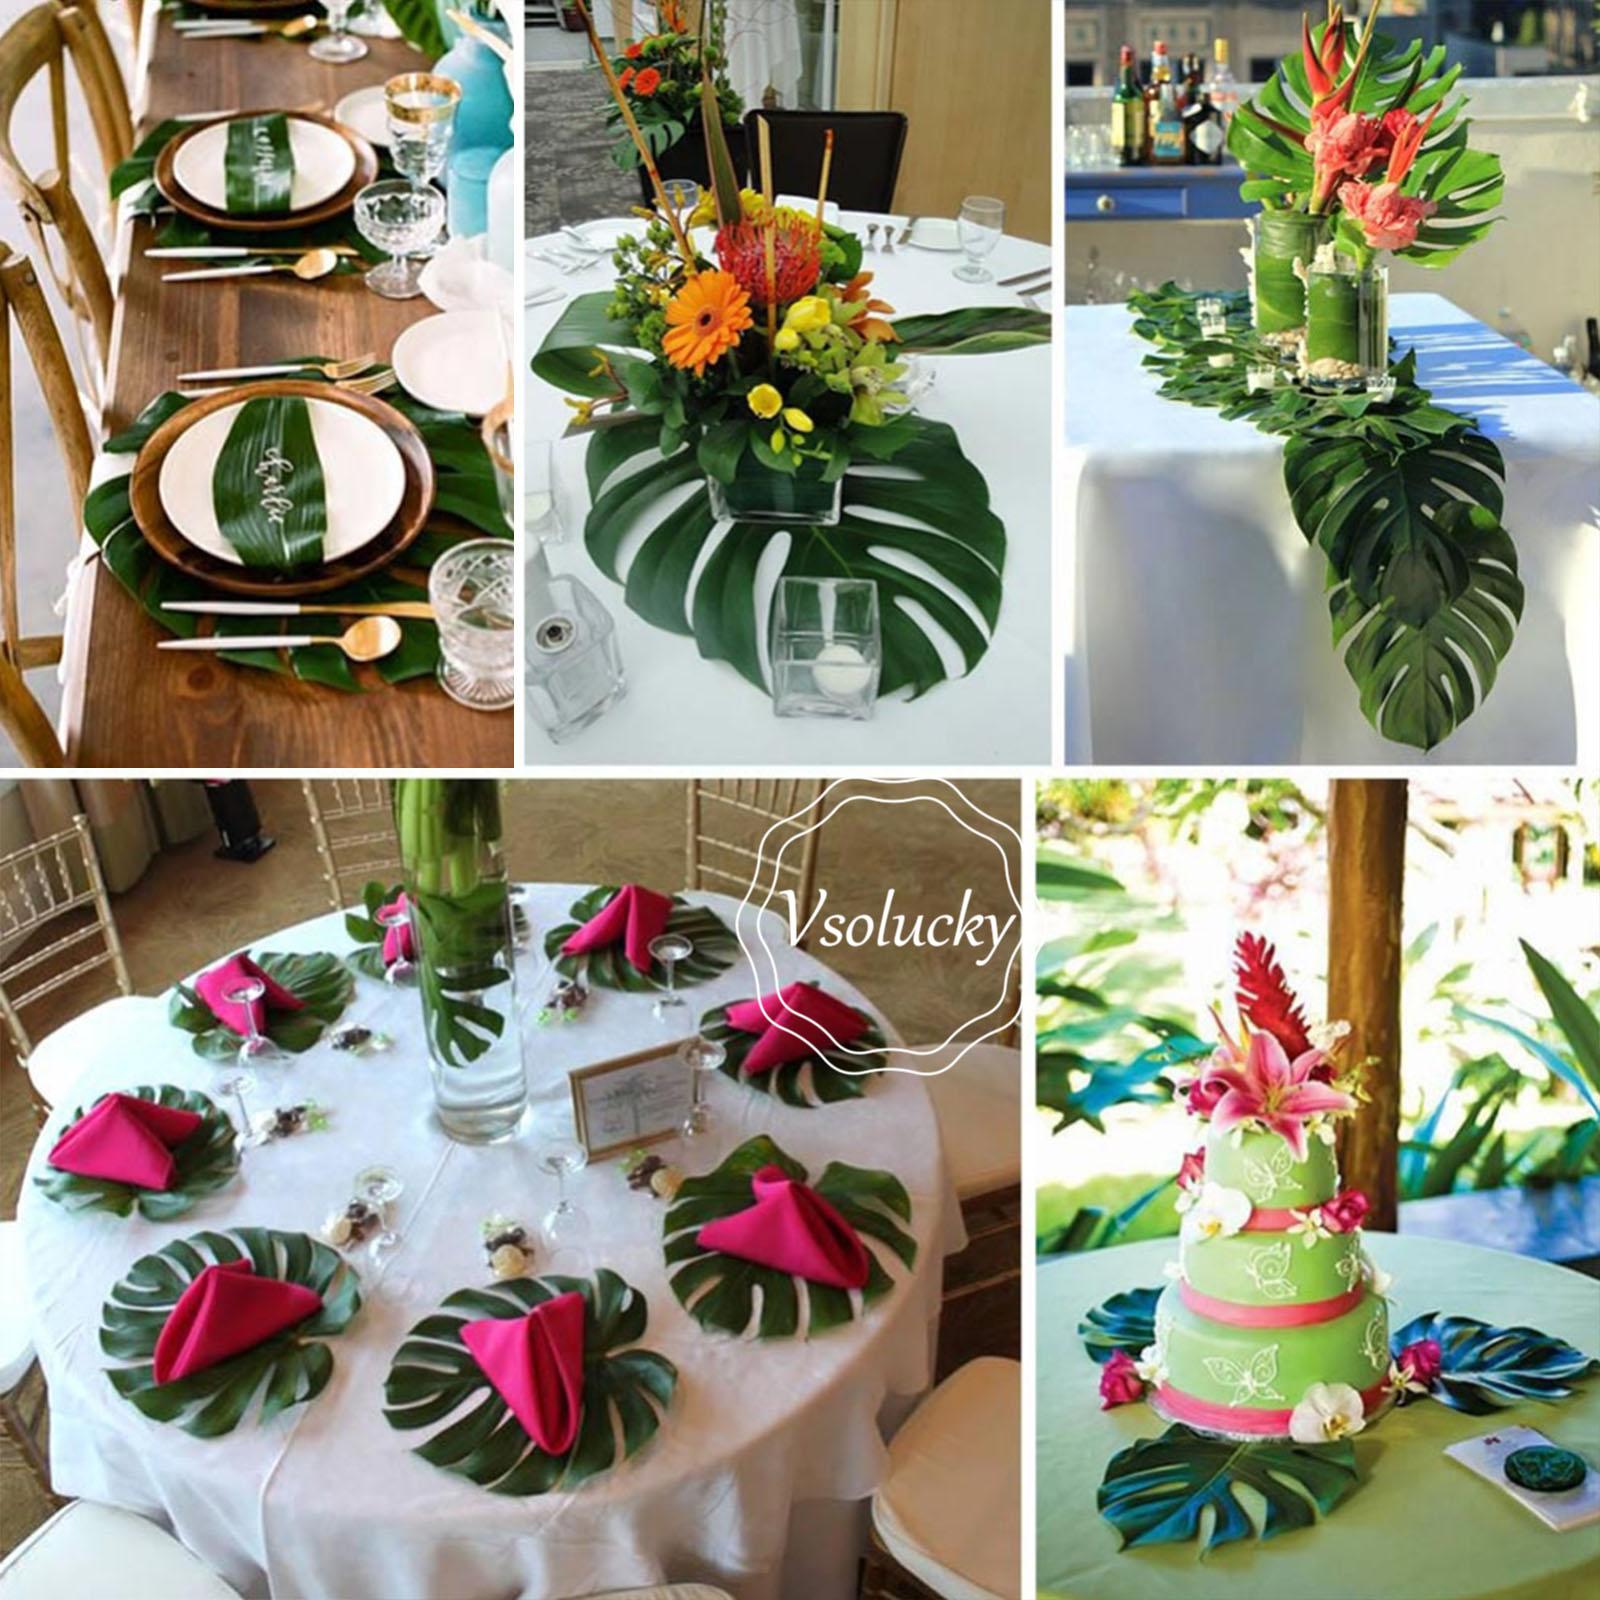 ideas decorations tropical decor best luau pinterest beach themed hawaiian on about party